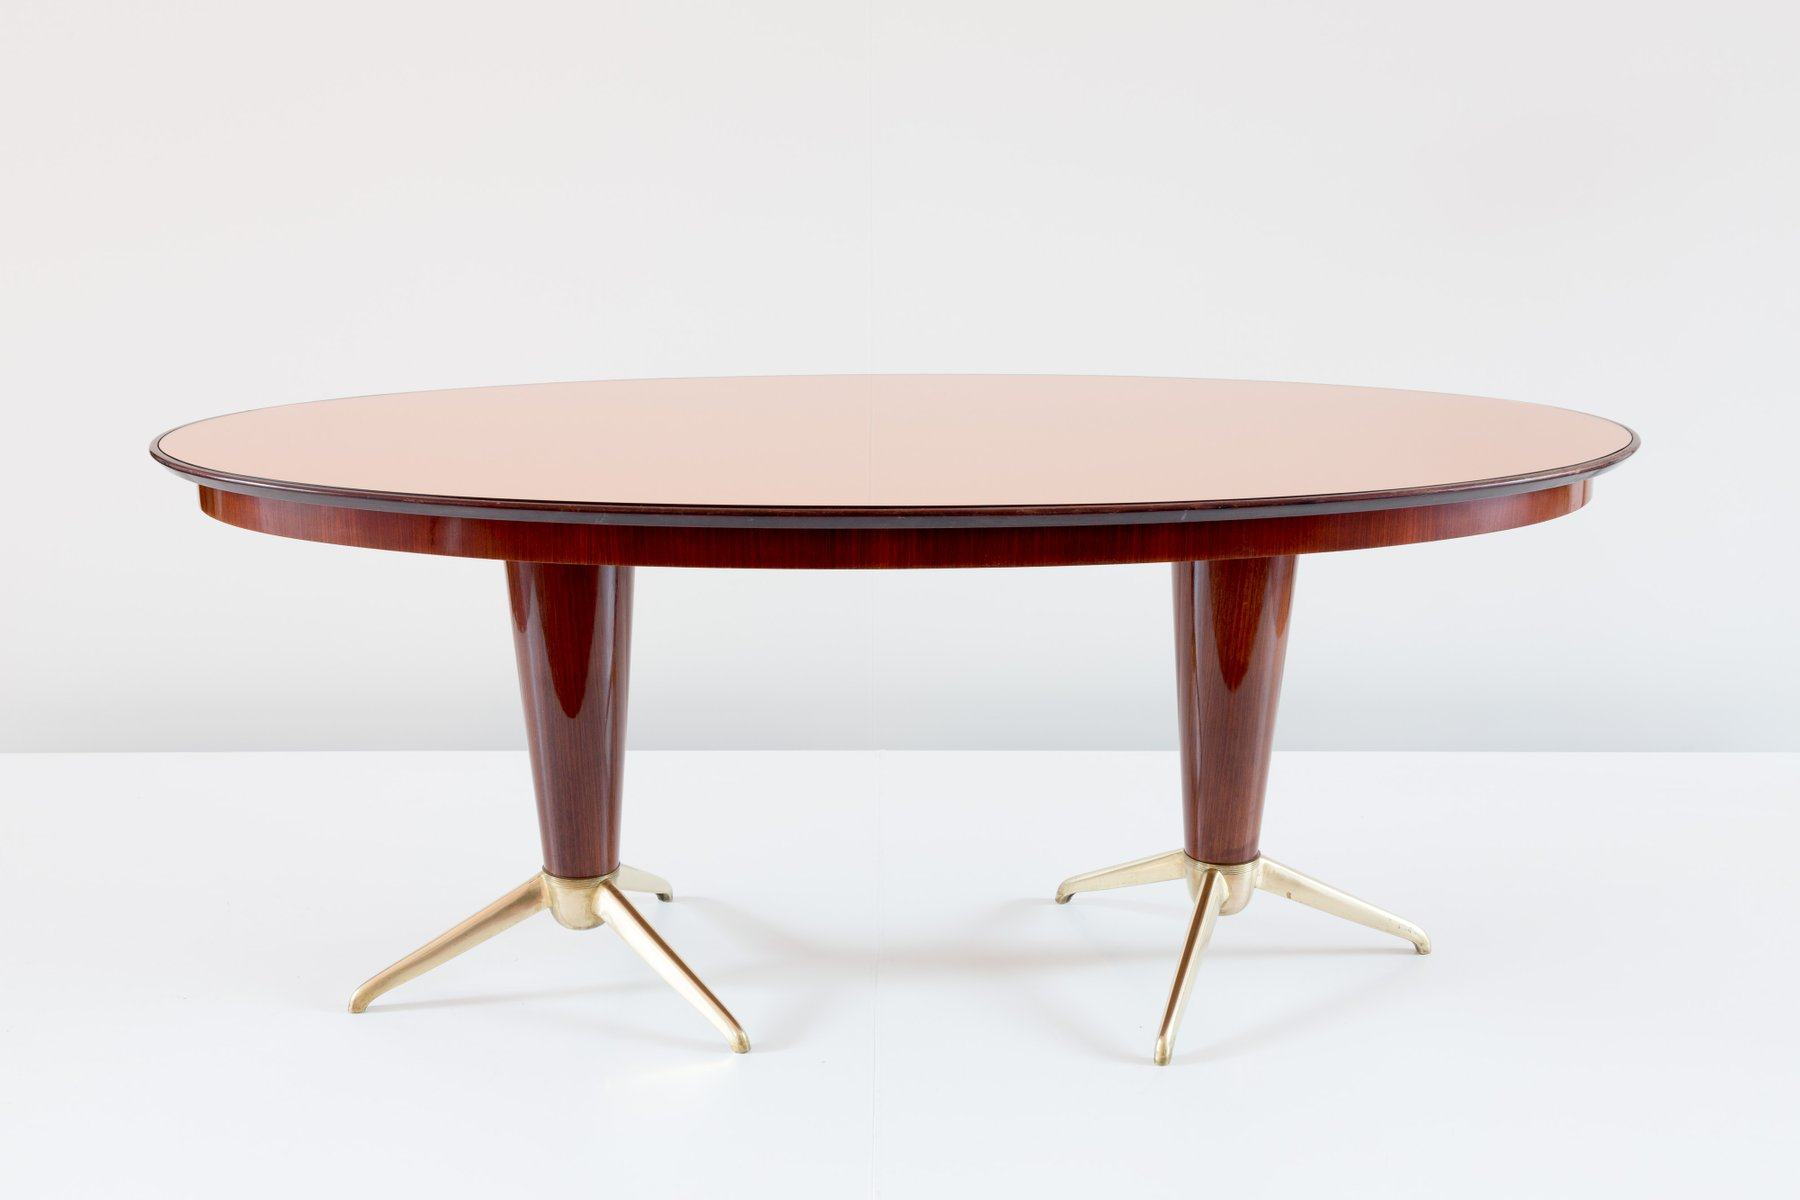 oval dining room. Italian Mahogany Oval Dining Table, 1952 Room M